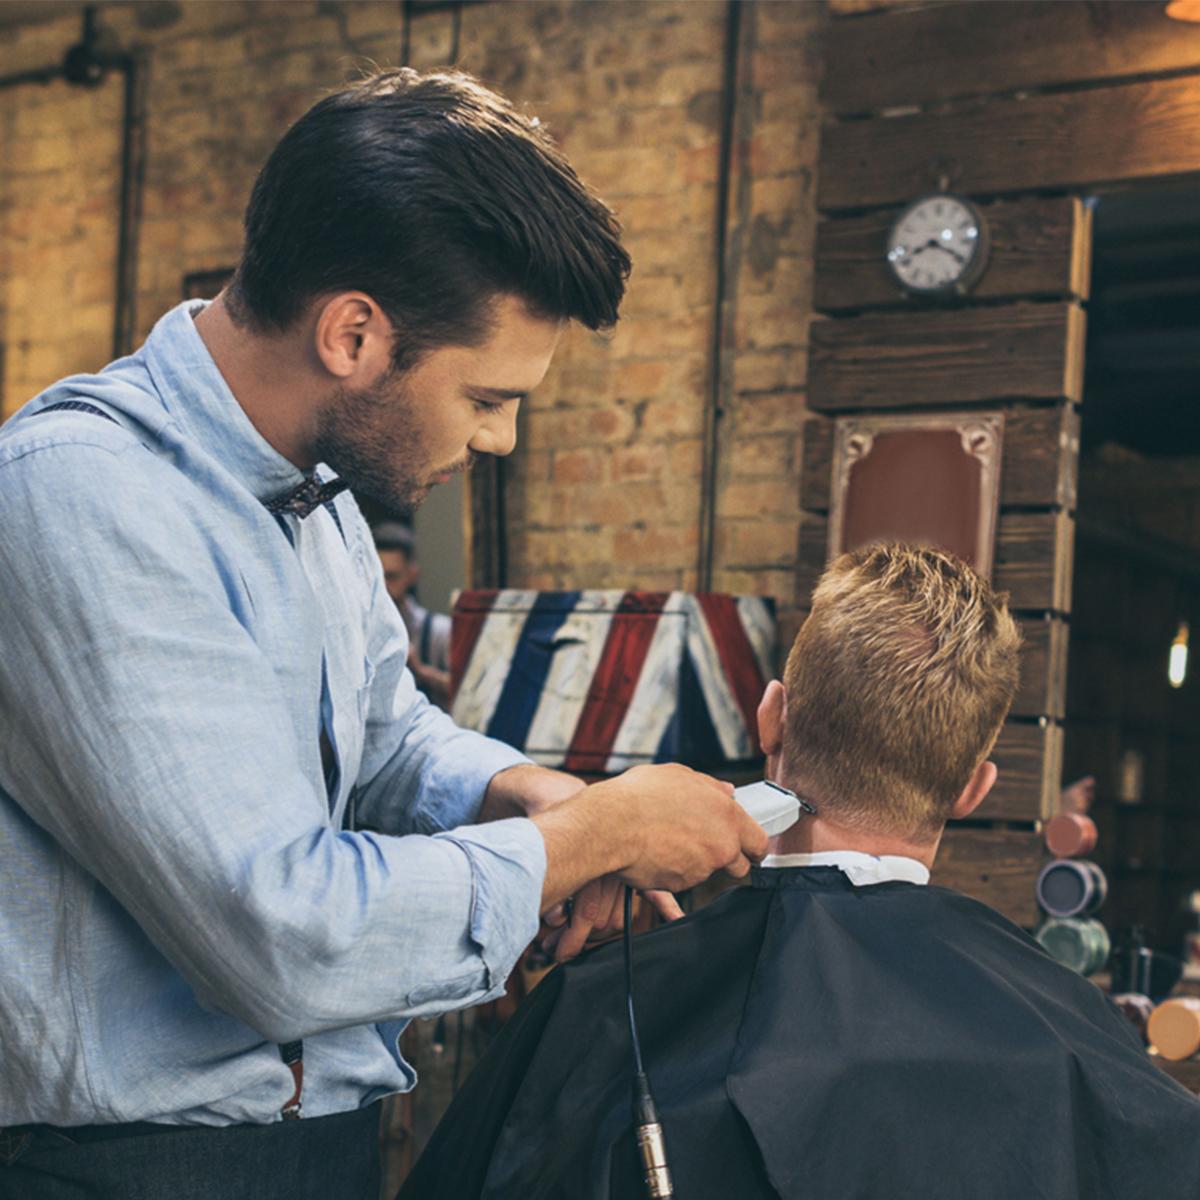 Barber Jargon Explained